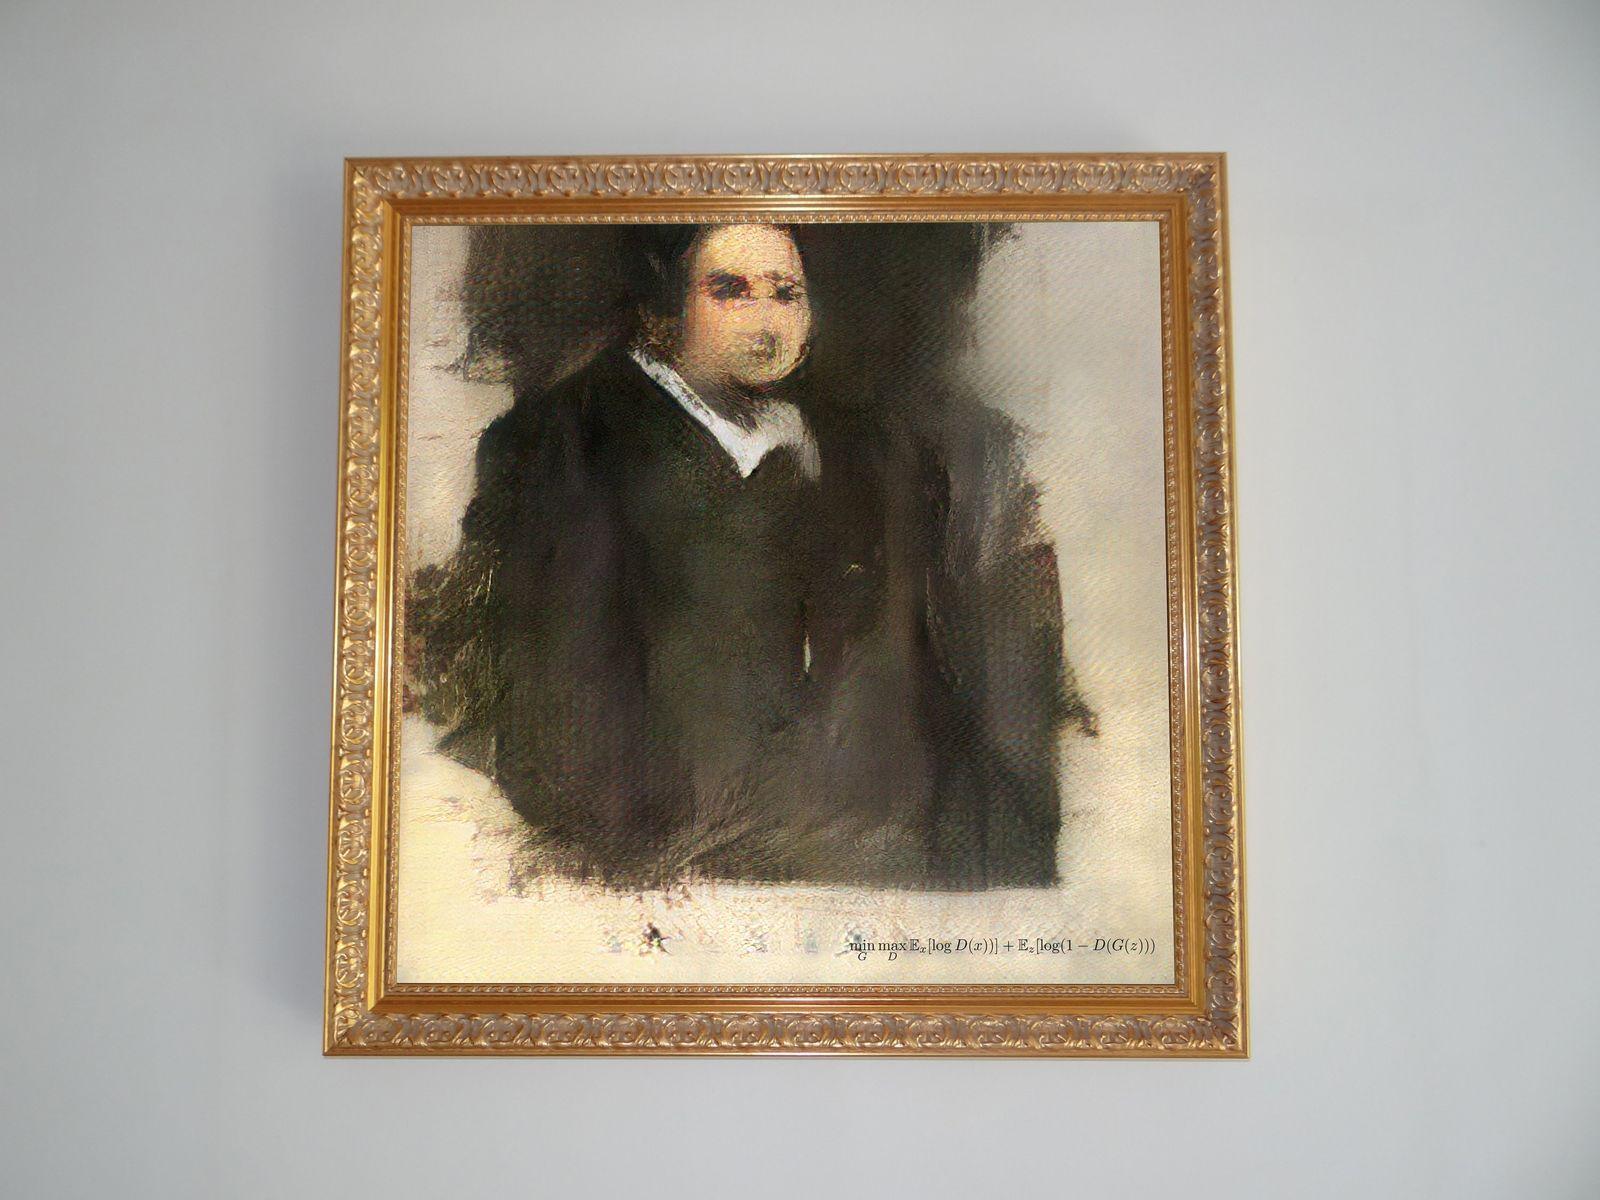 Christies versteigert erstmals KI-Gemälde